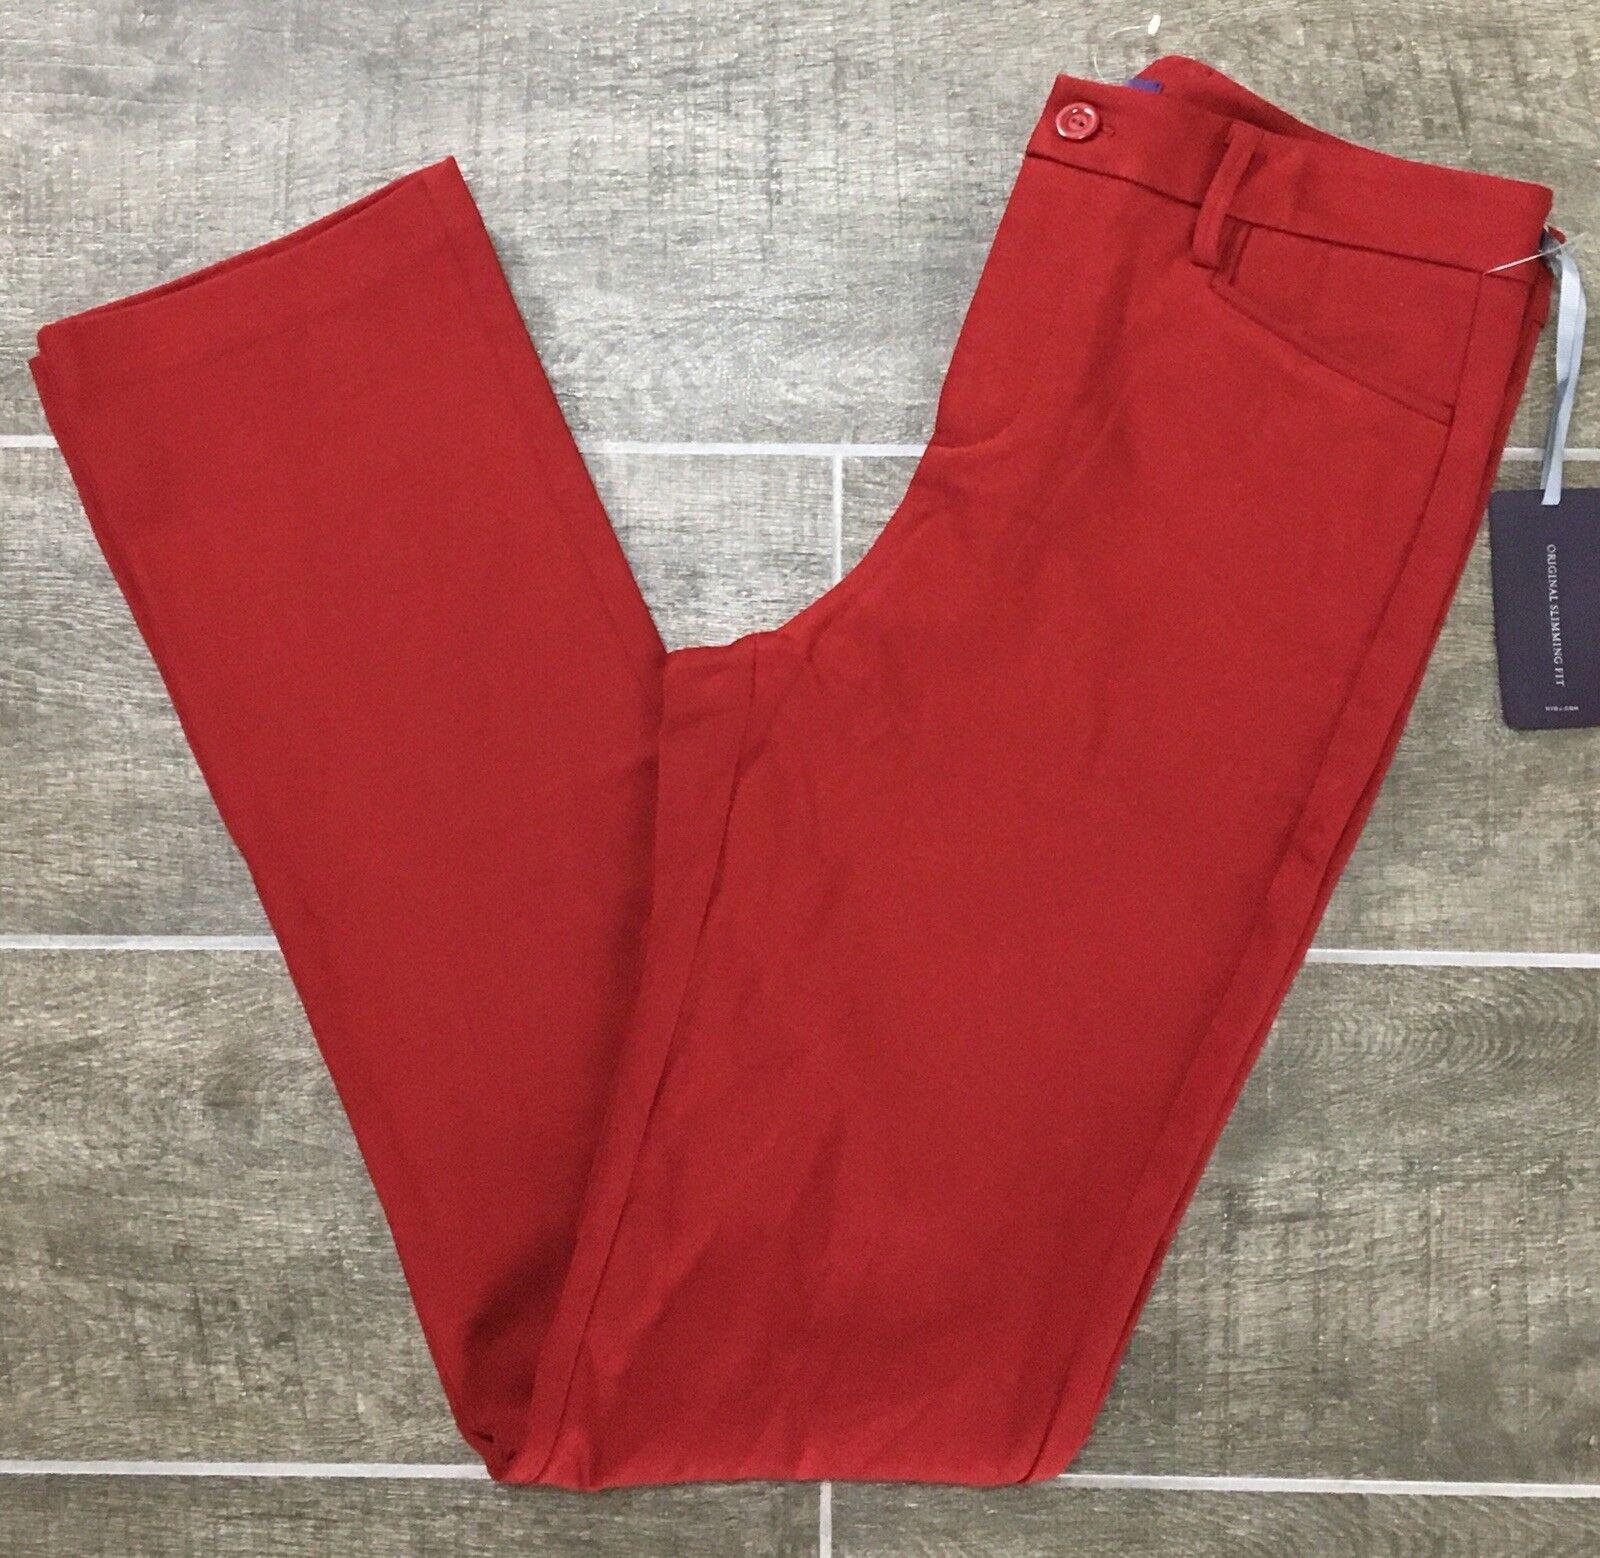 NYDJ Ponte Pants Women's Size 4 Stretch Knit Red J1101